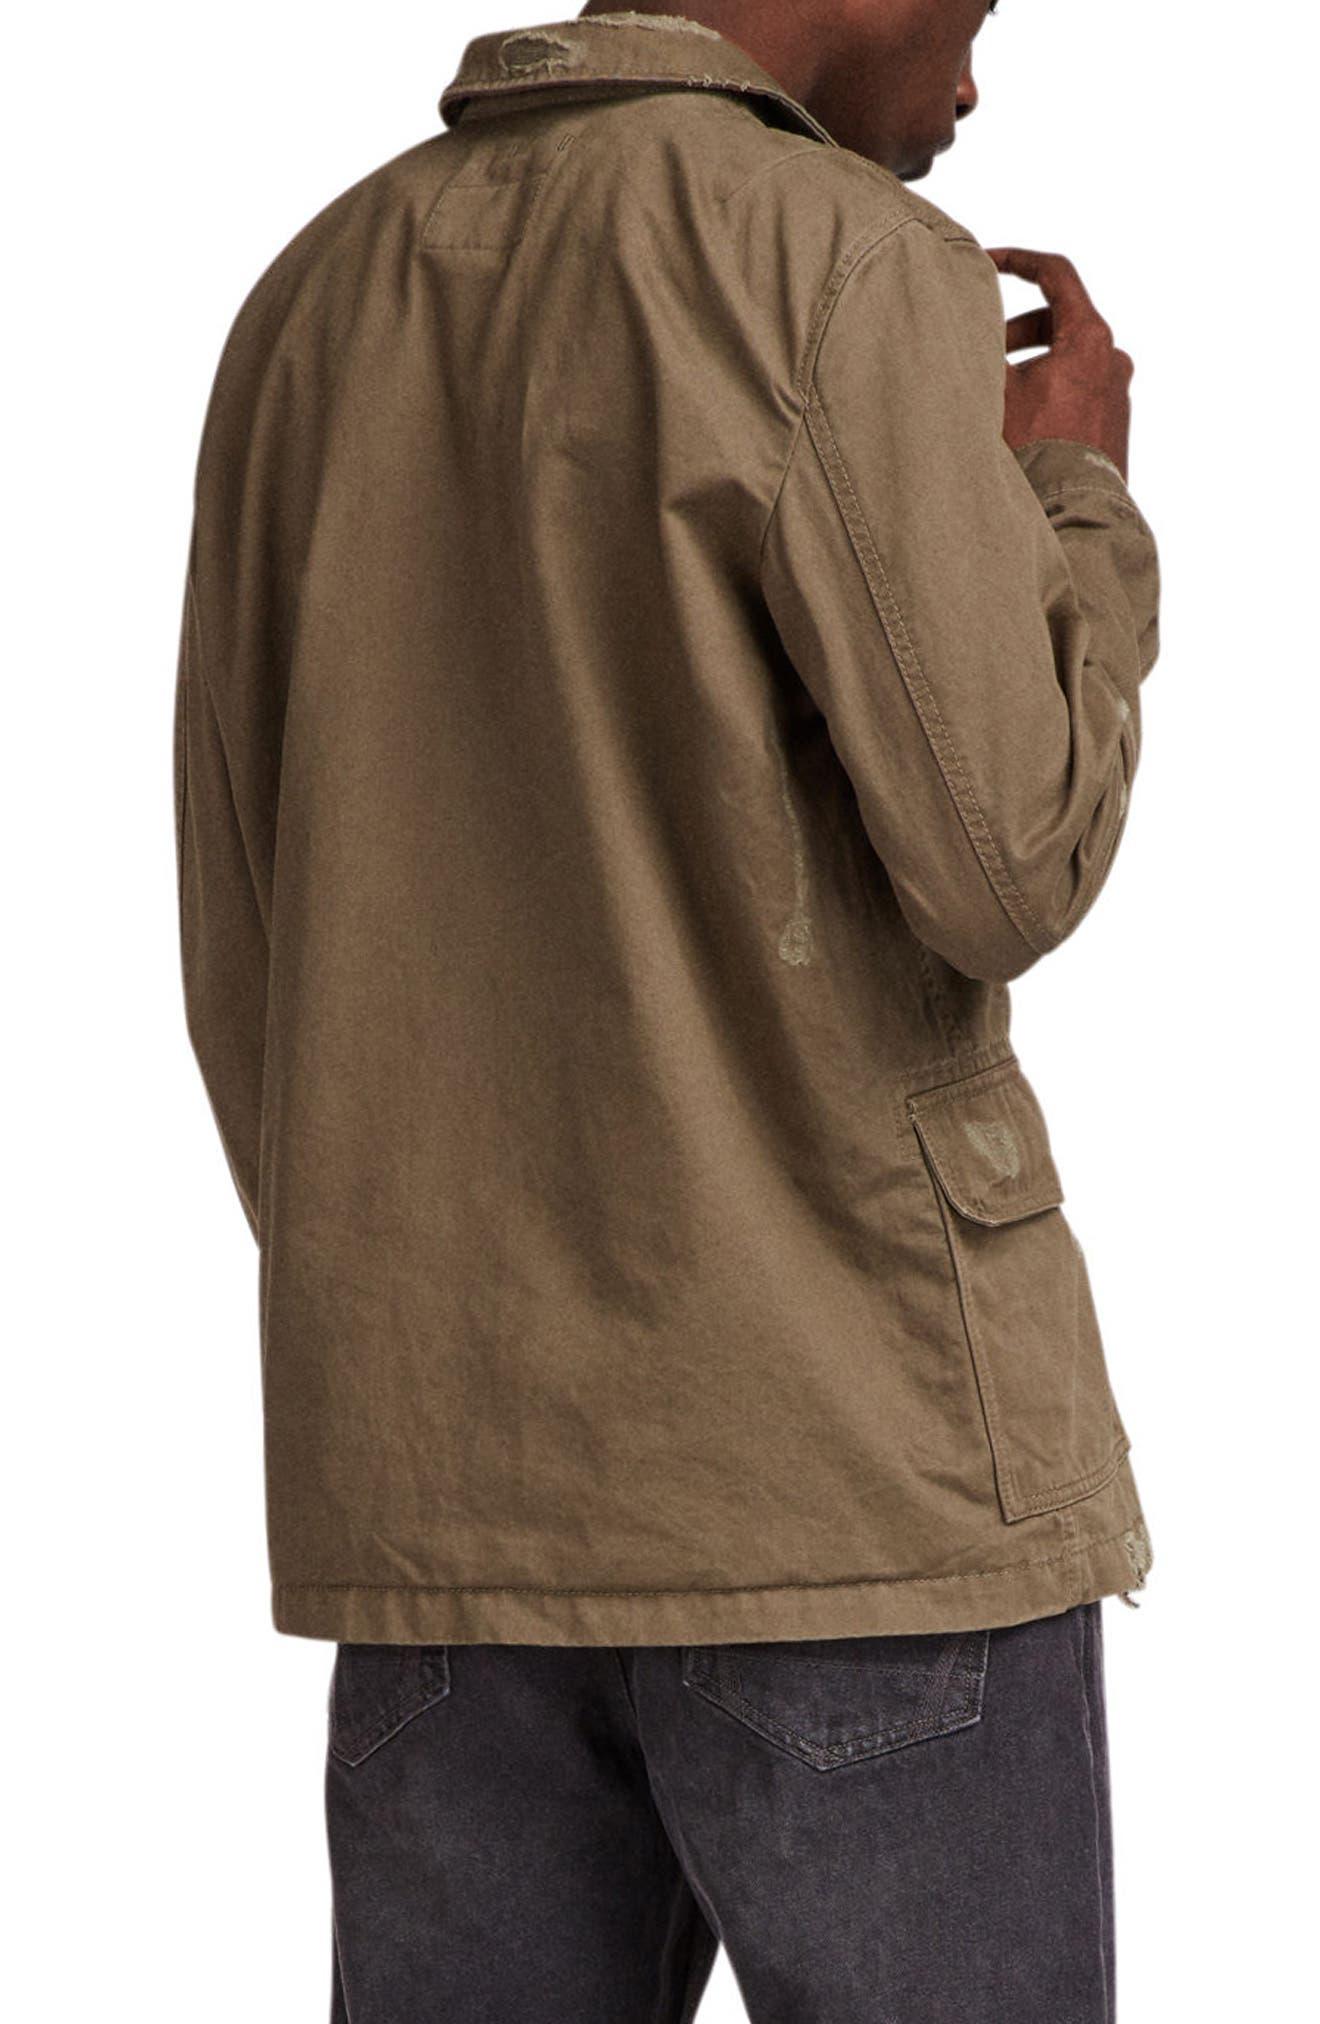 Sasaki Shirt Jacket,                             Alternate thumbnail 2, color,                             Khaki Green